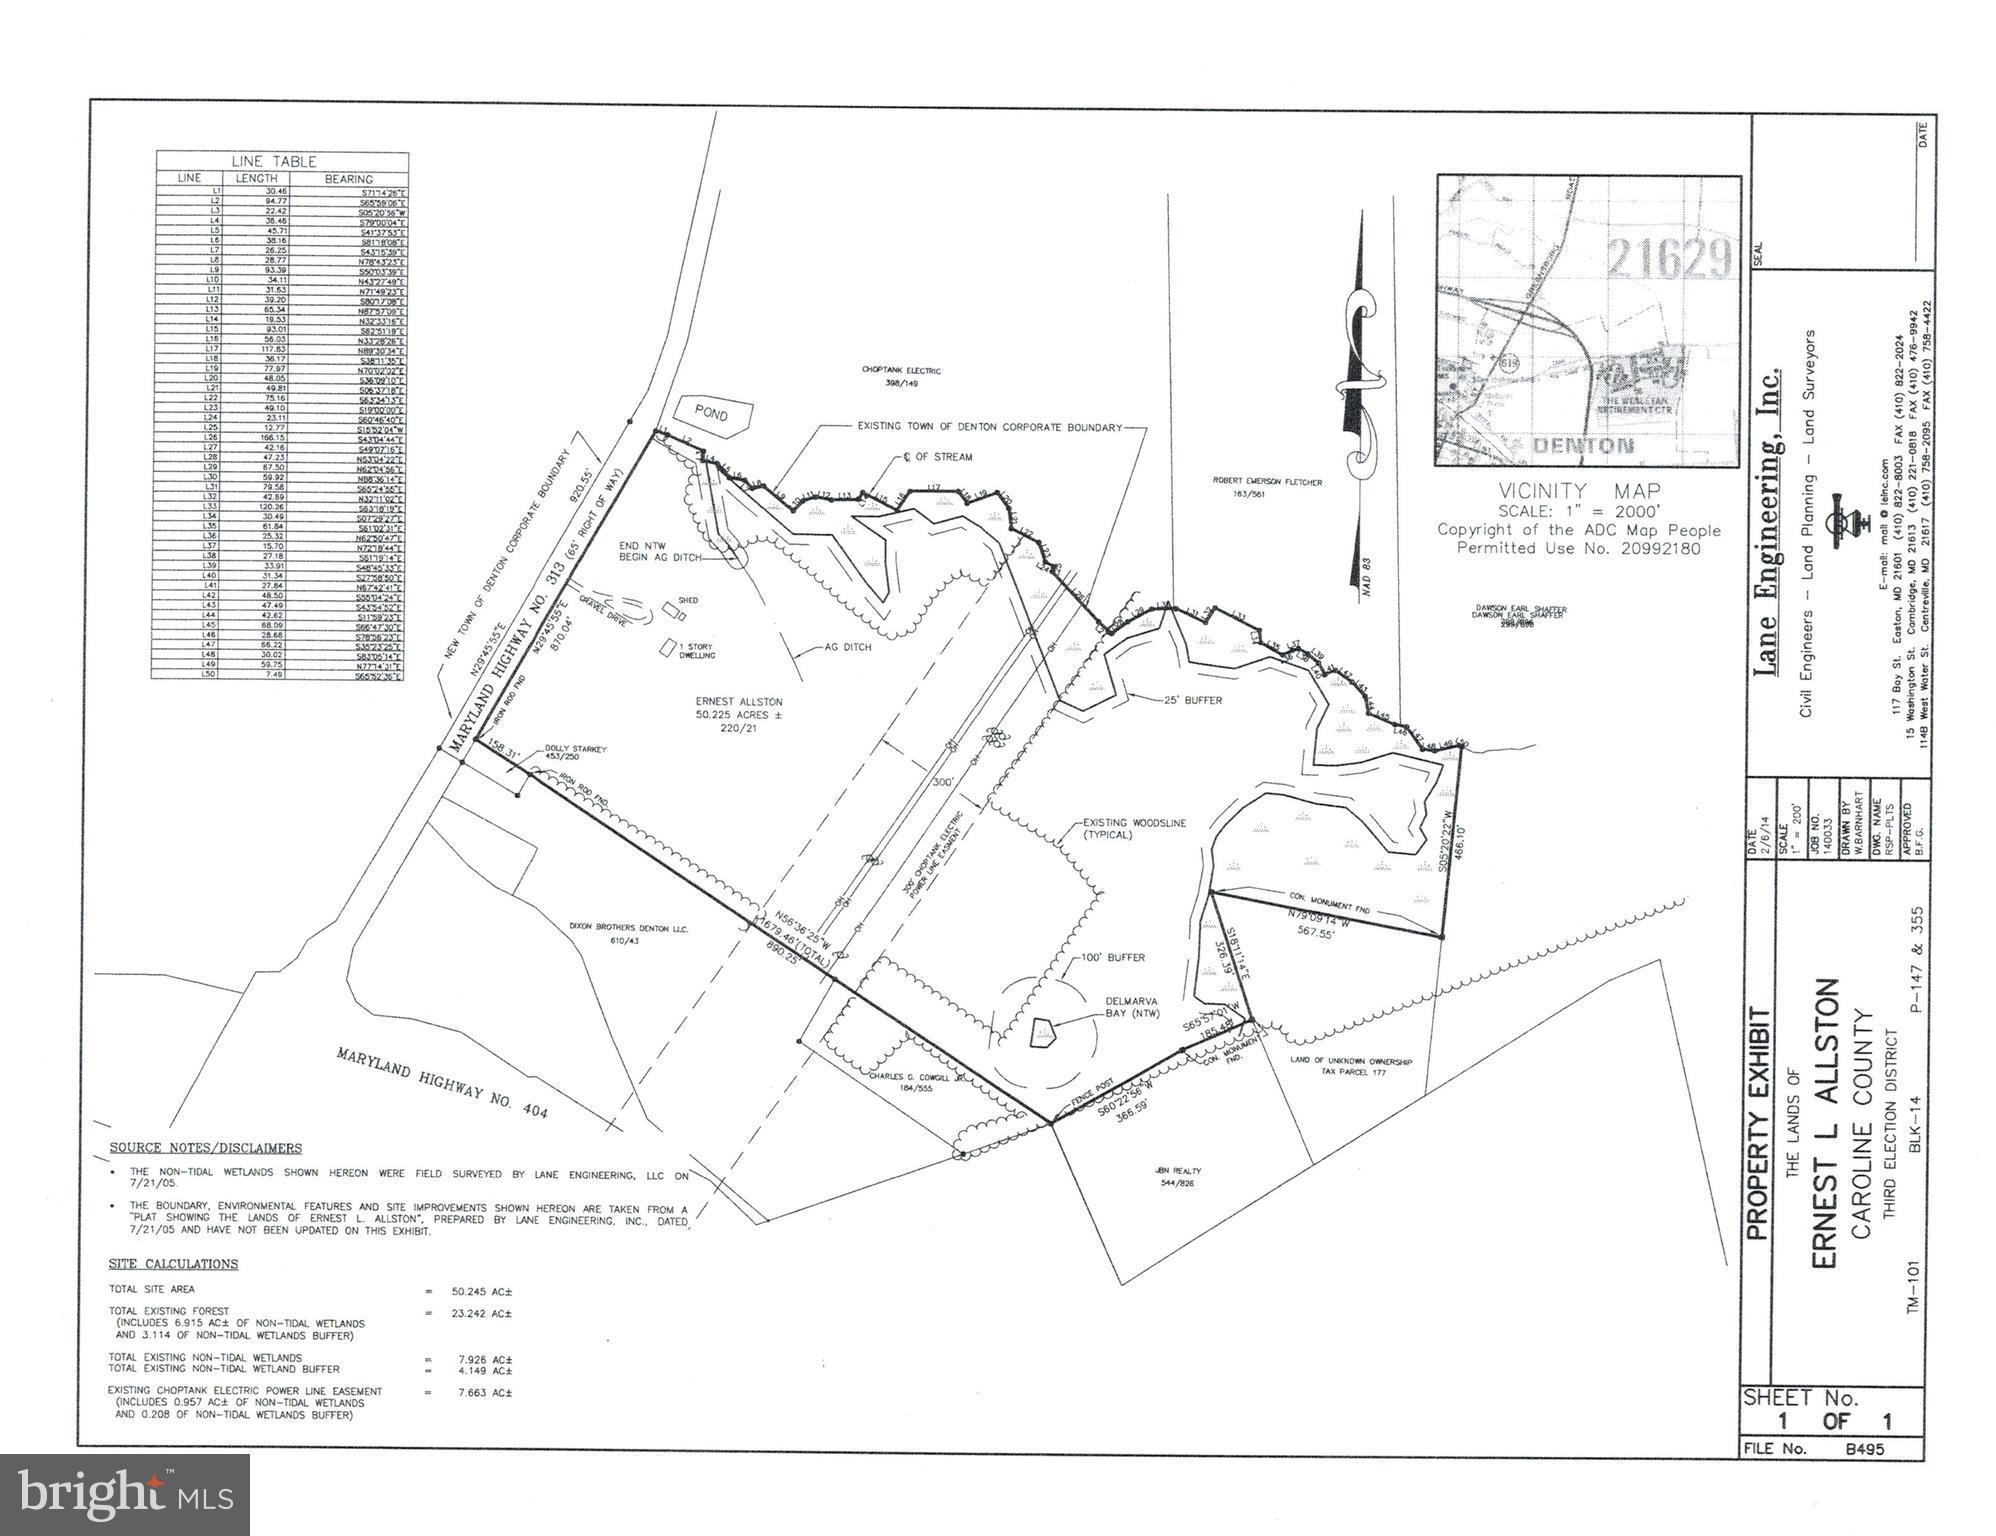 10591 GREENSBORO ROAD, DENTON, MD 21629